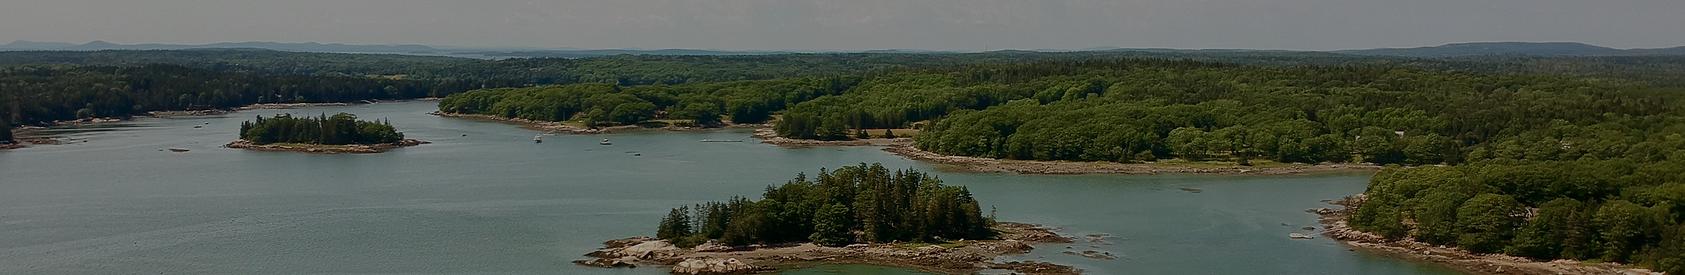 Maine_BG.png